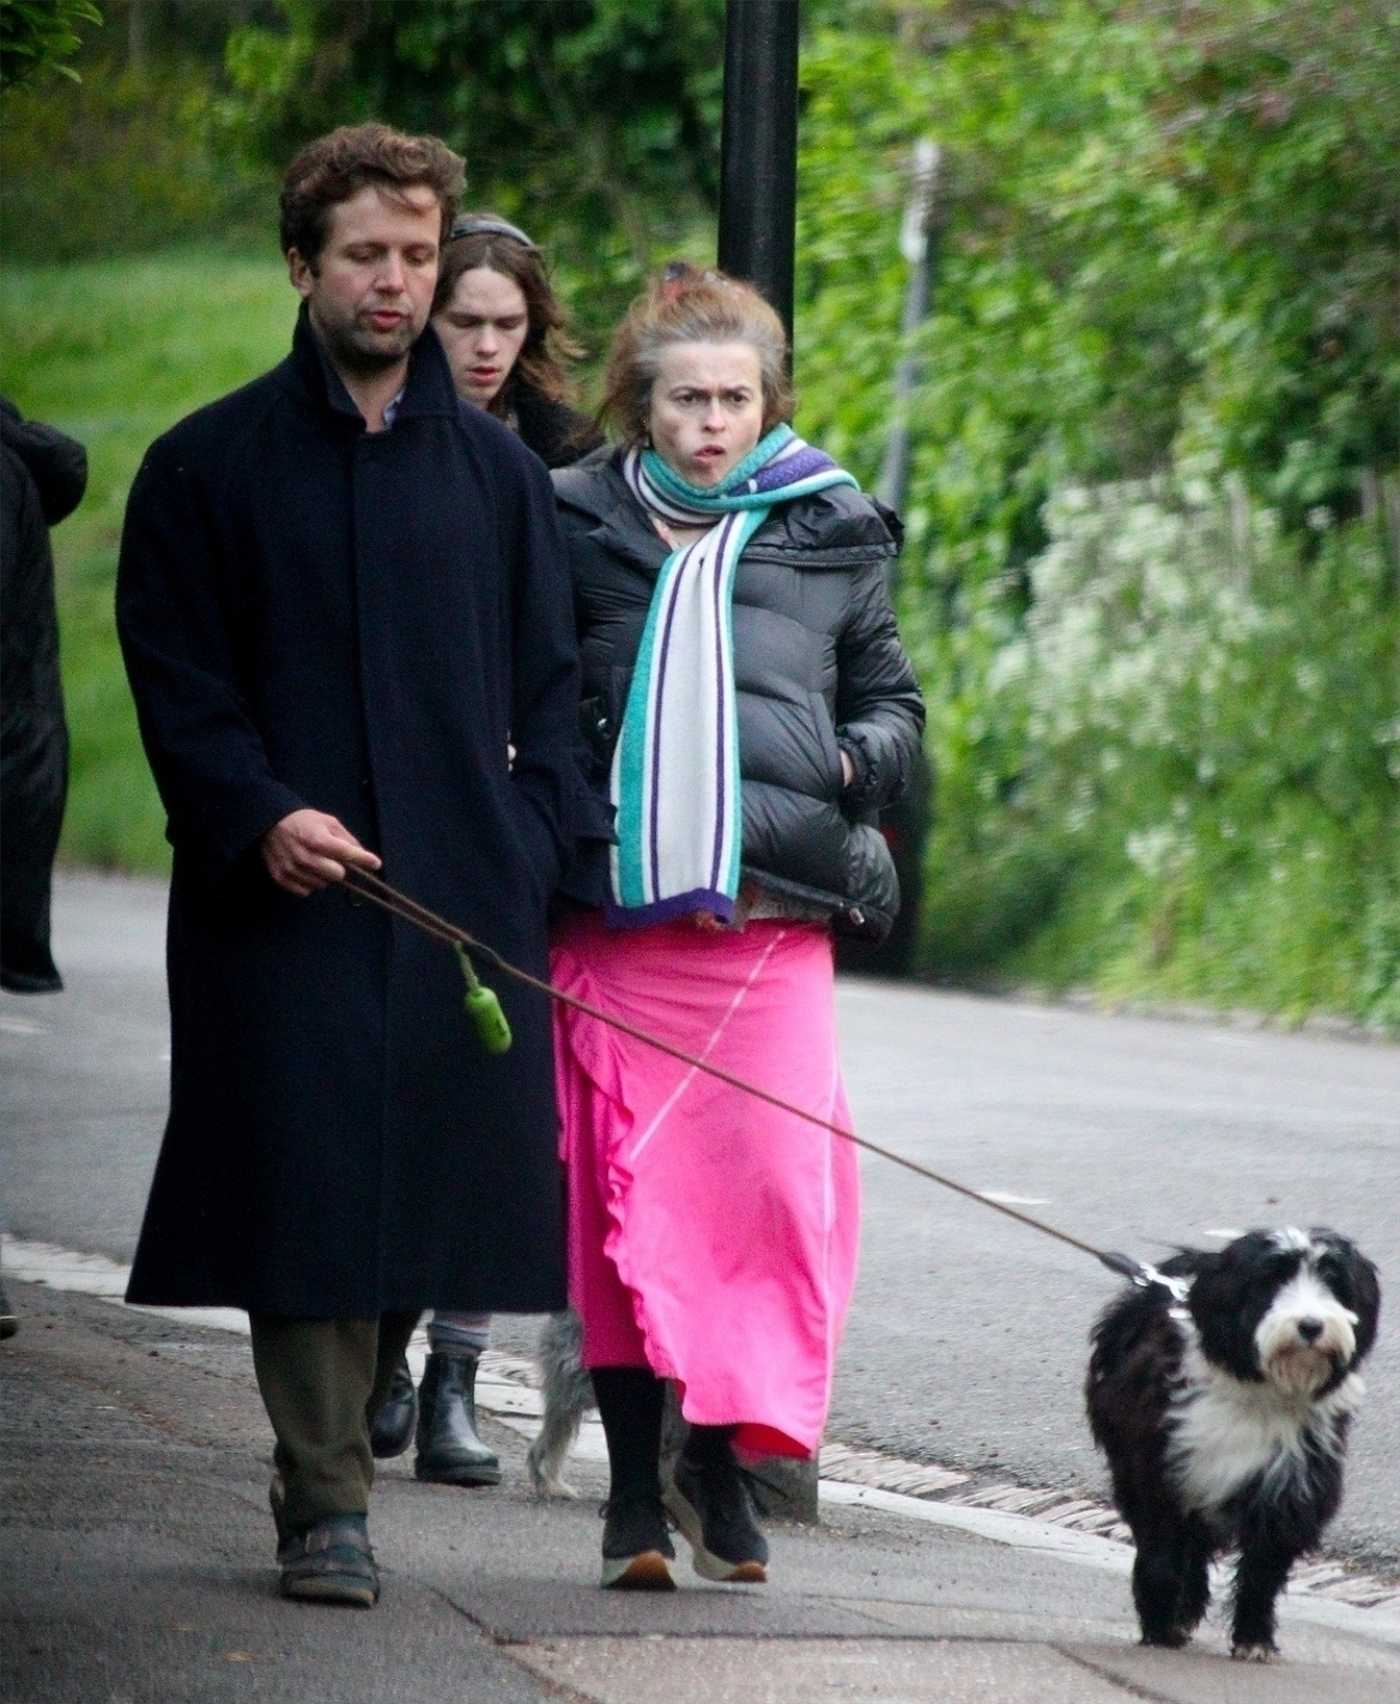 Helena Bonham Carter in a Black Jacket Walks Her Dog Out with Rye Dag Holmboe in London 04/17/2020